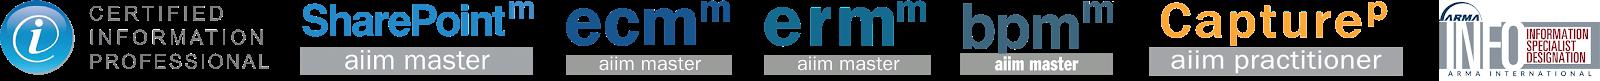 Certified Information Professional CIP, ECM Master, ERM Master, BPM Master, SharePoint Master, Capture Practitioner, ARMA, AIIM, INFO